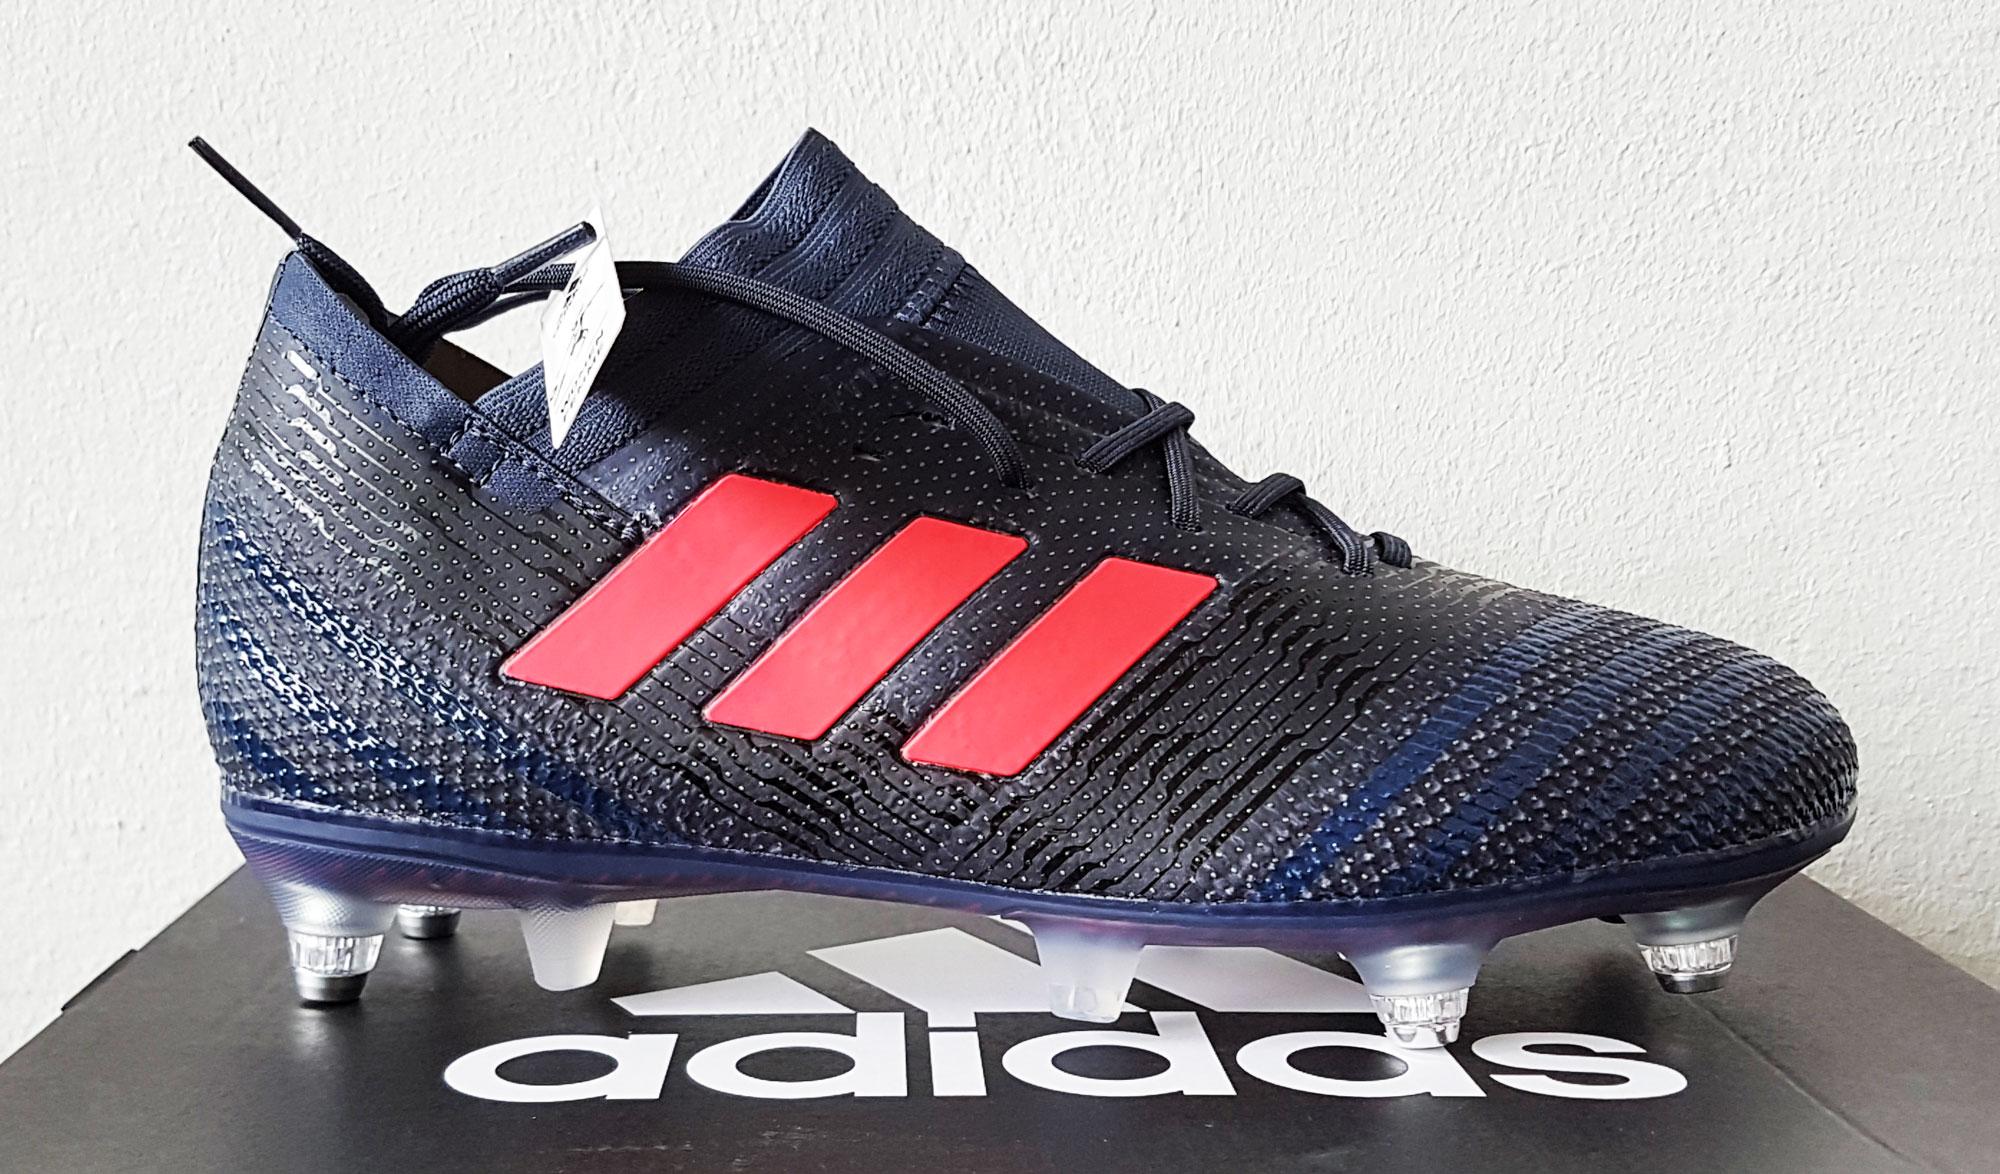 good san francisco buying now Adidas Nemeziz 17.1 W SG Damen Fußballschuh blau/pink AC7068